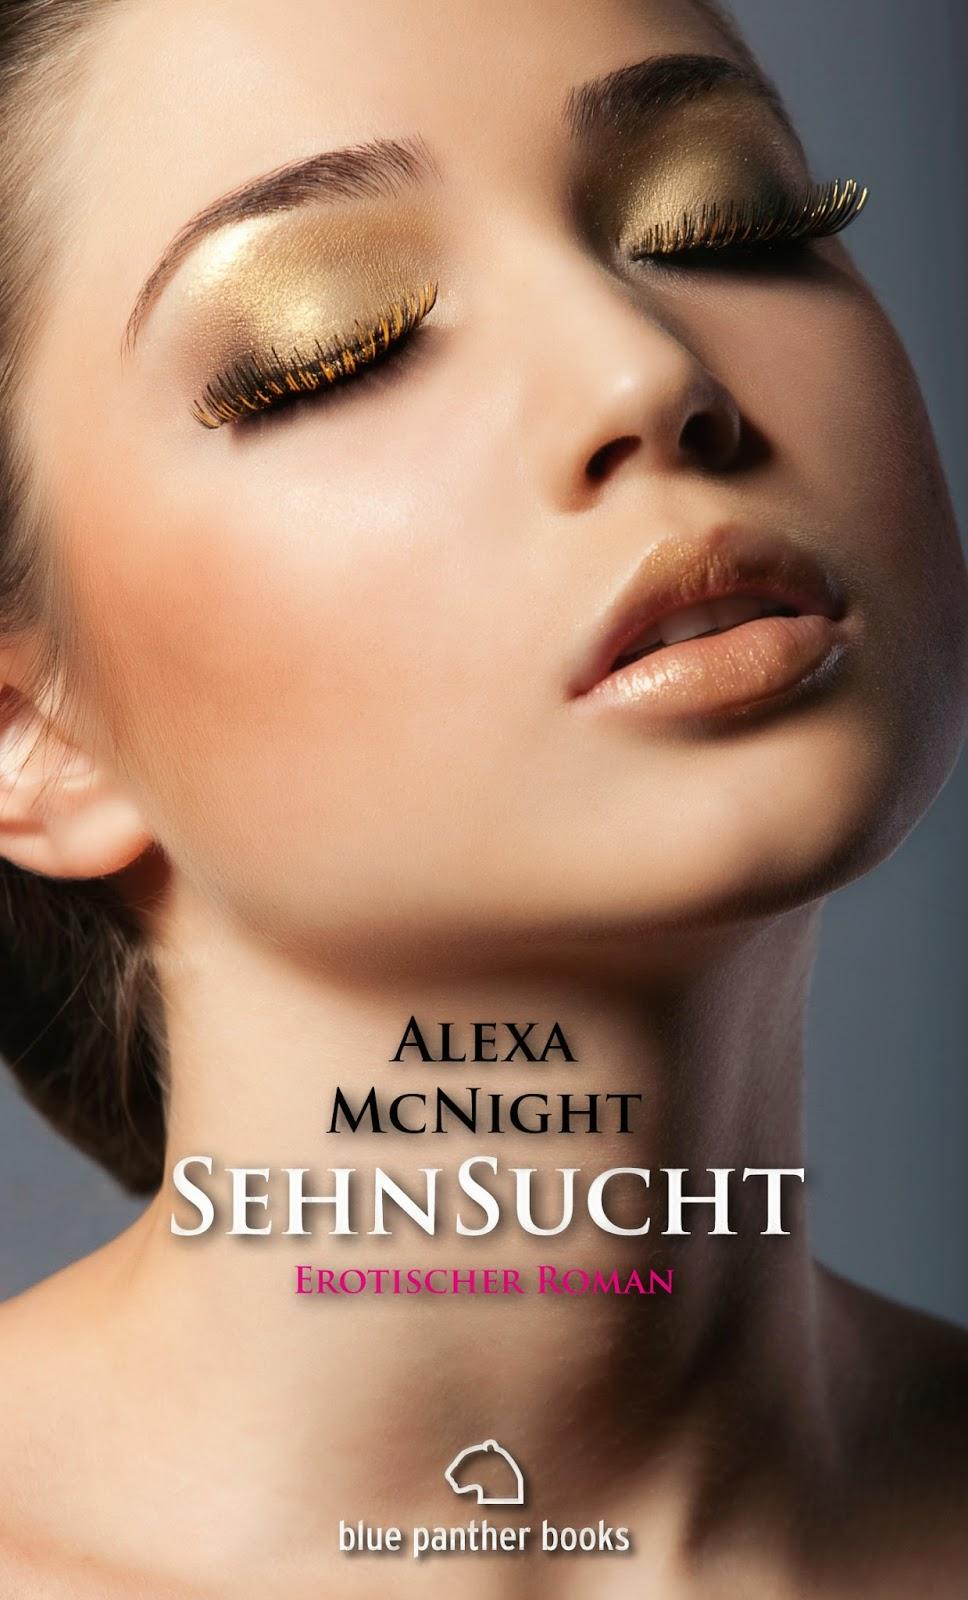 http://www.blue-panther-books.de/de/leseprobe/leseprobe_mc1.html